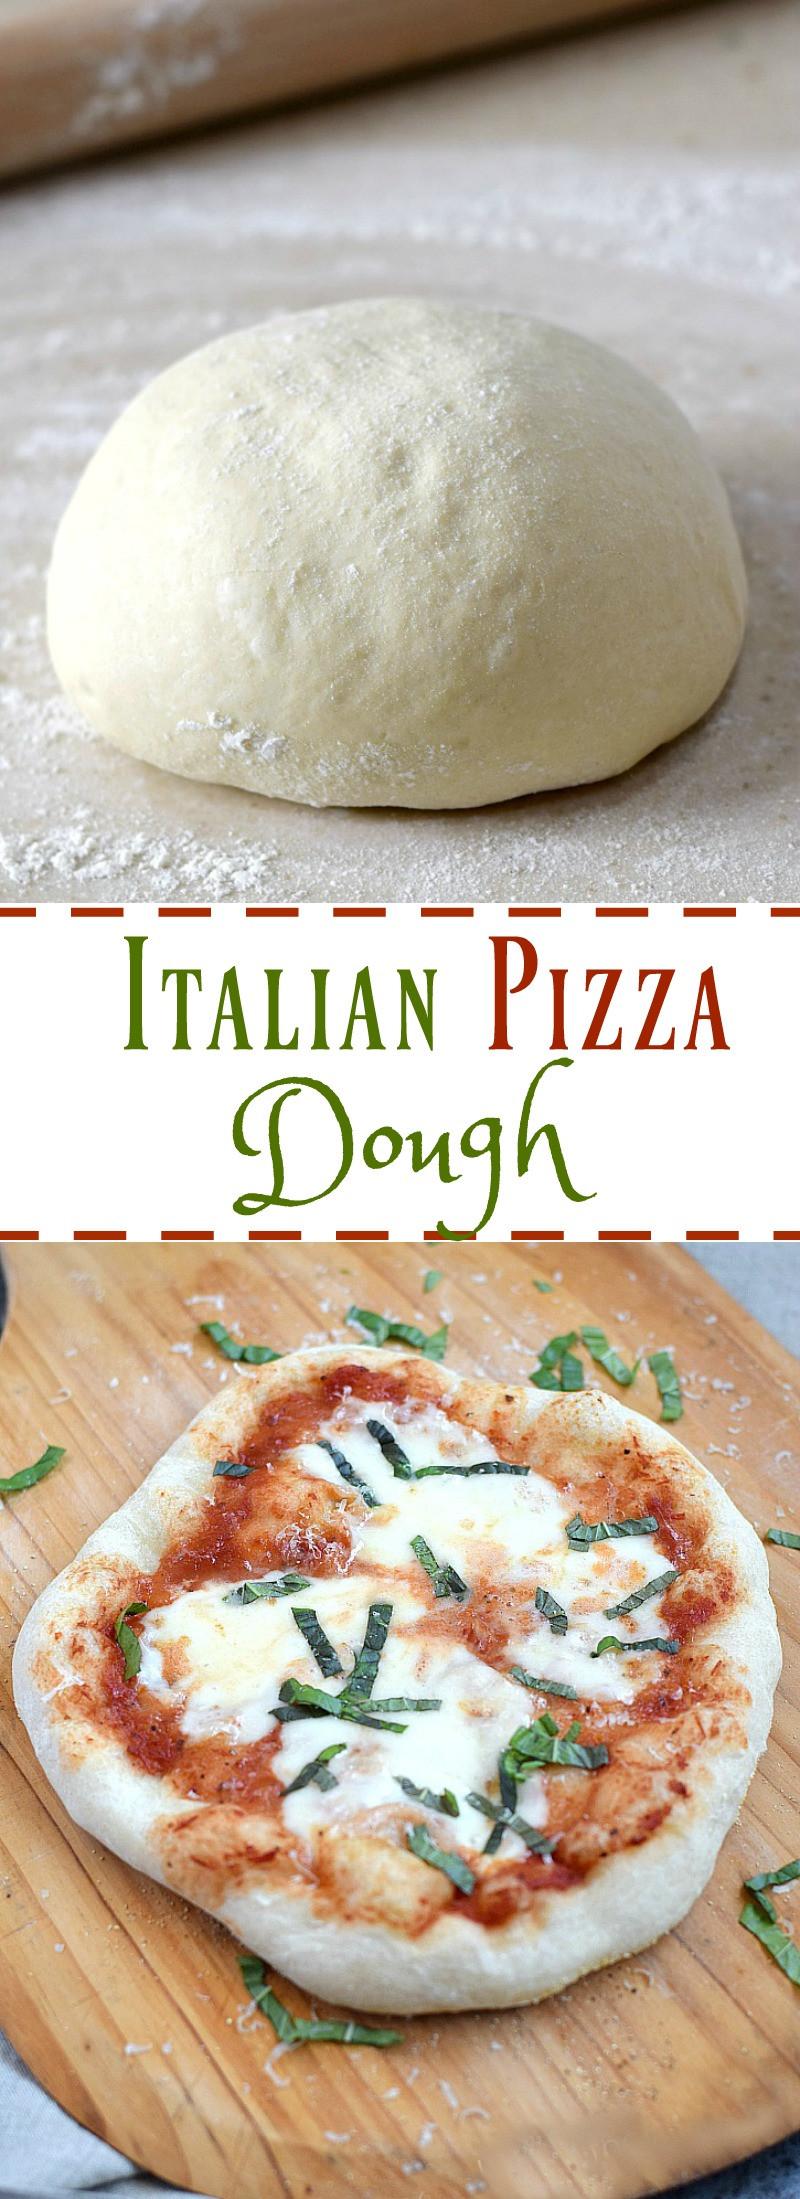 Italian Pizza Dough Recipe  Italian Pizza Dough Cooking With Curls